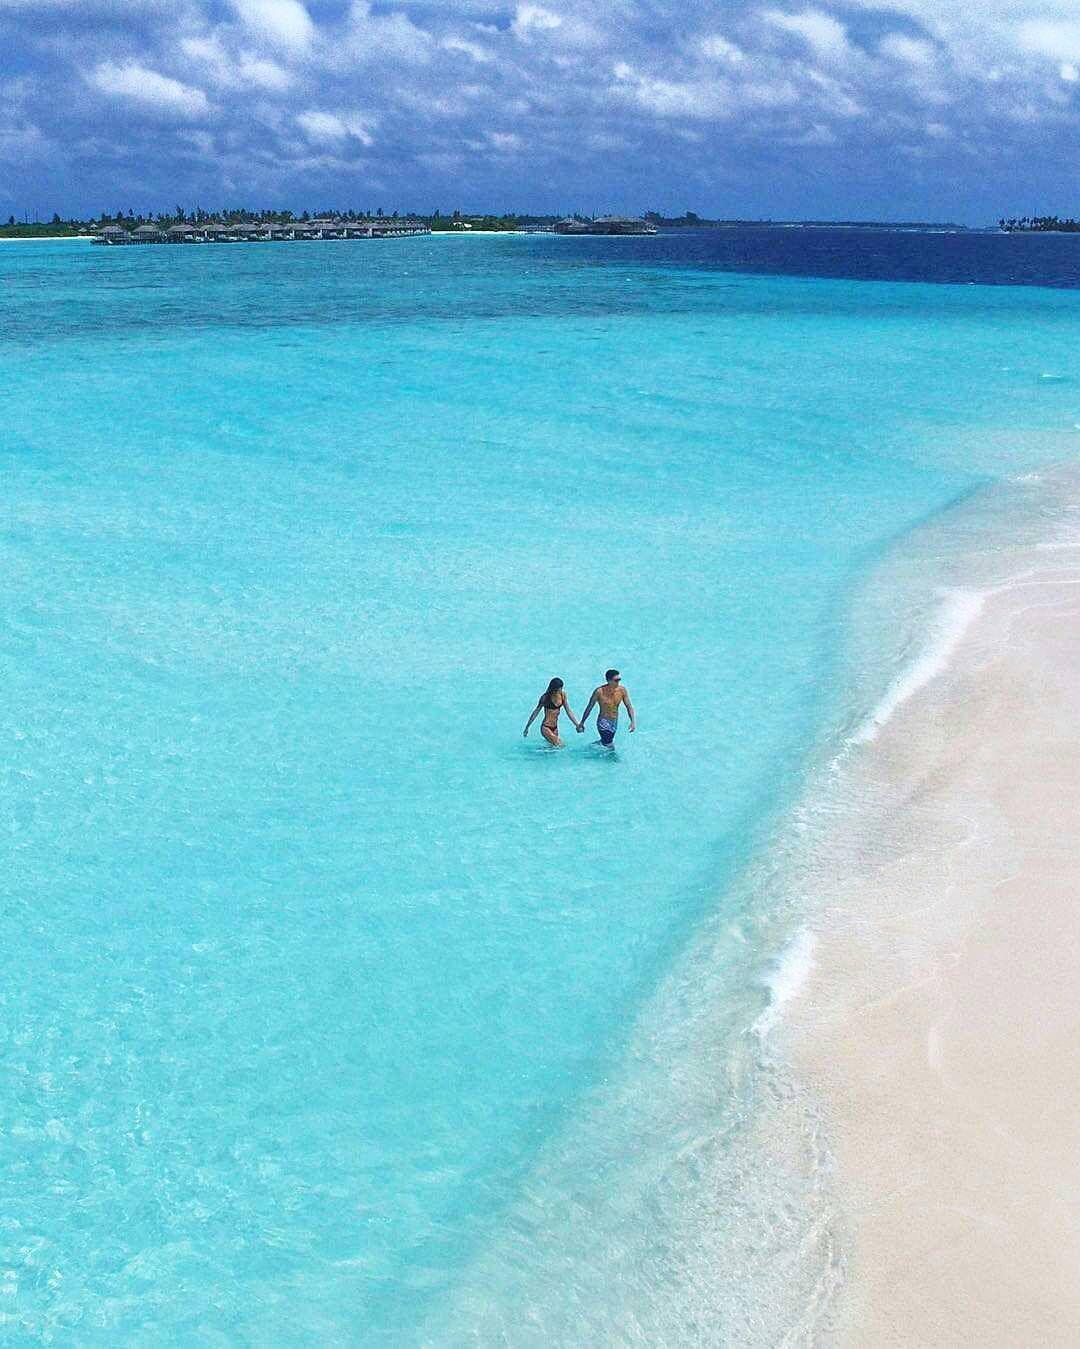 Maldives Beach: Six Senses Laamu - @helenowen